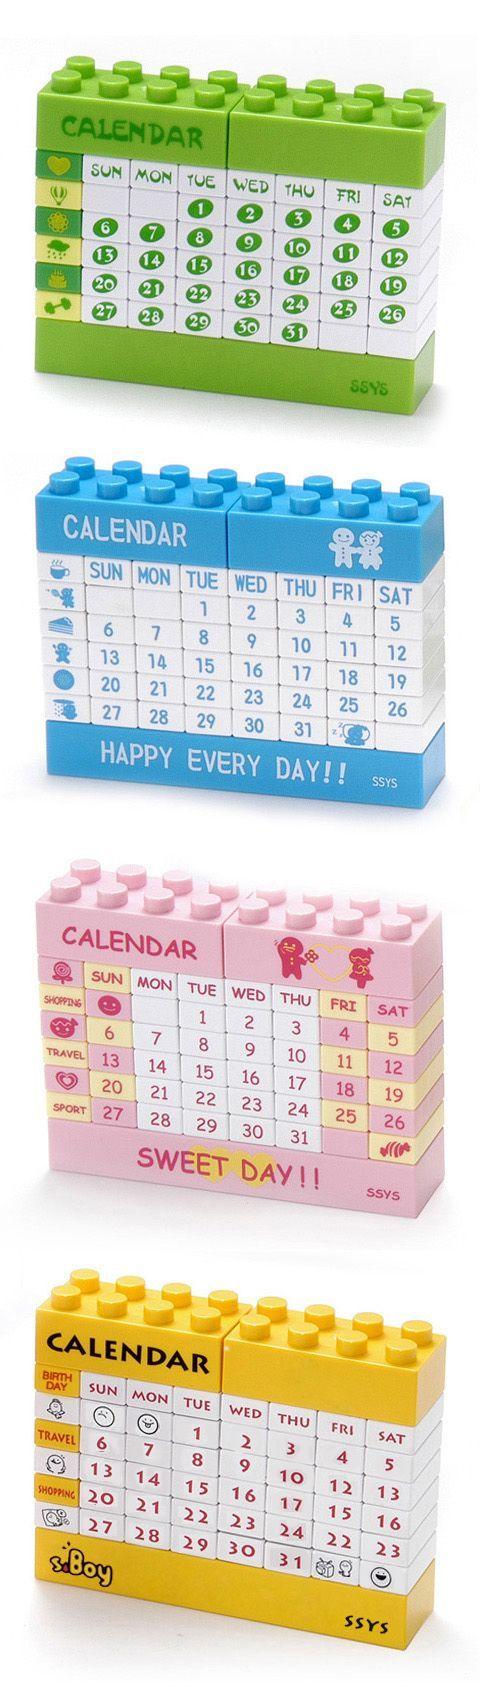 Diy lego puzzle calendar desktop calendar perpetual calendar and lego diy lego puzzle calendar solutioingenieria Image collections